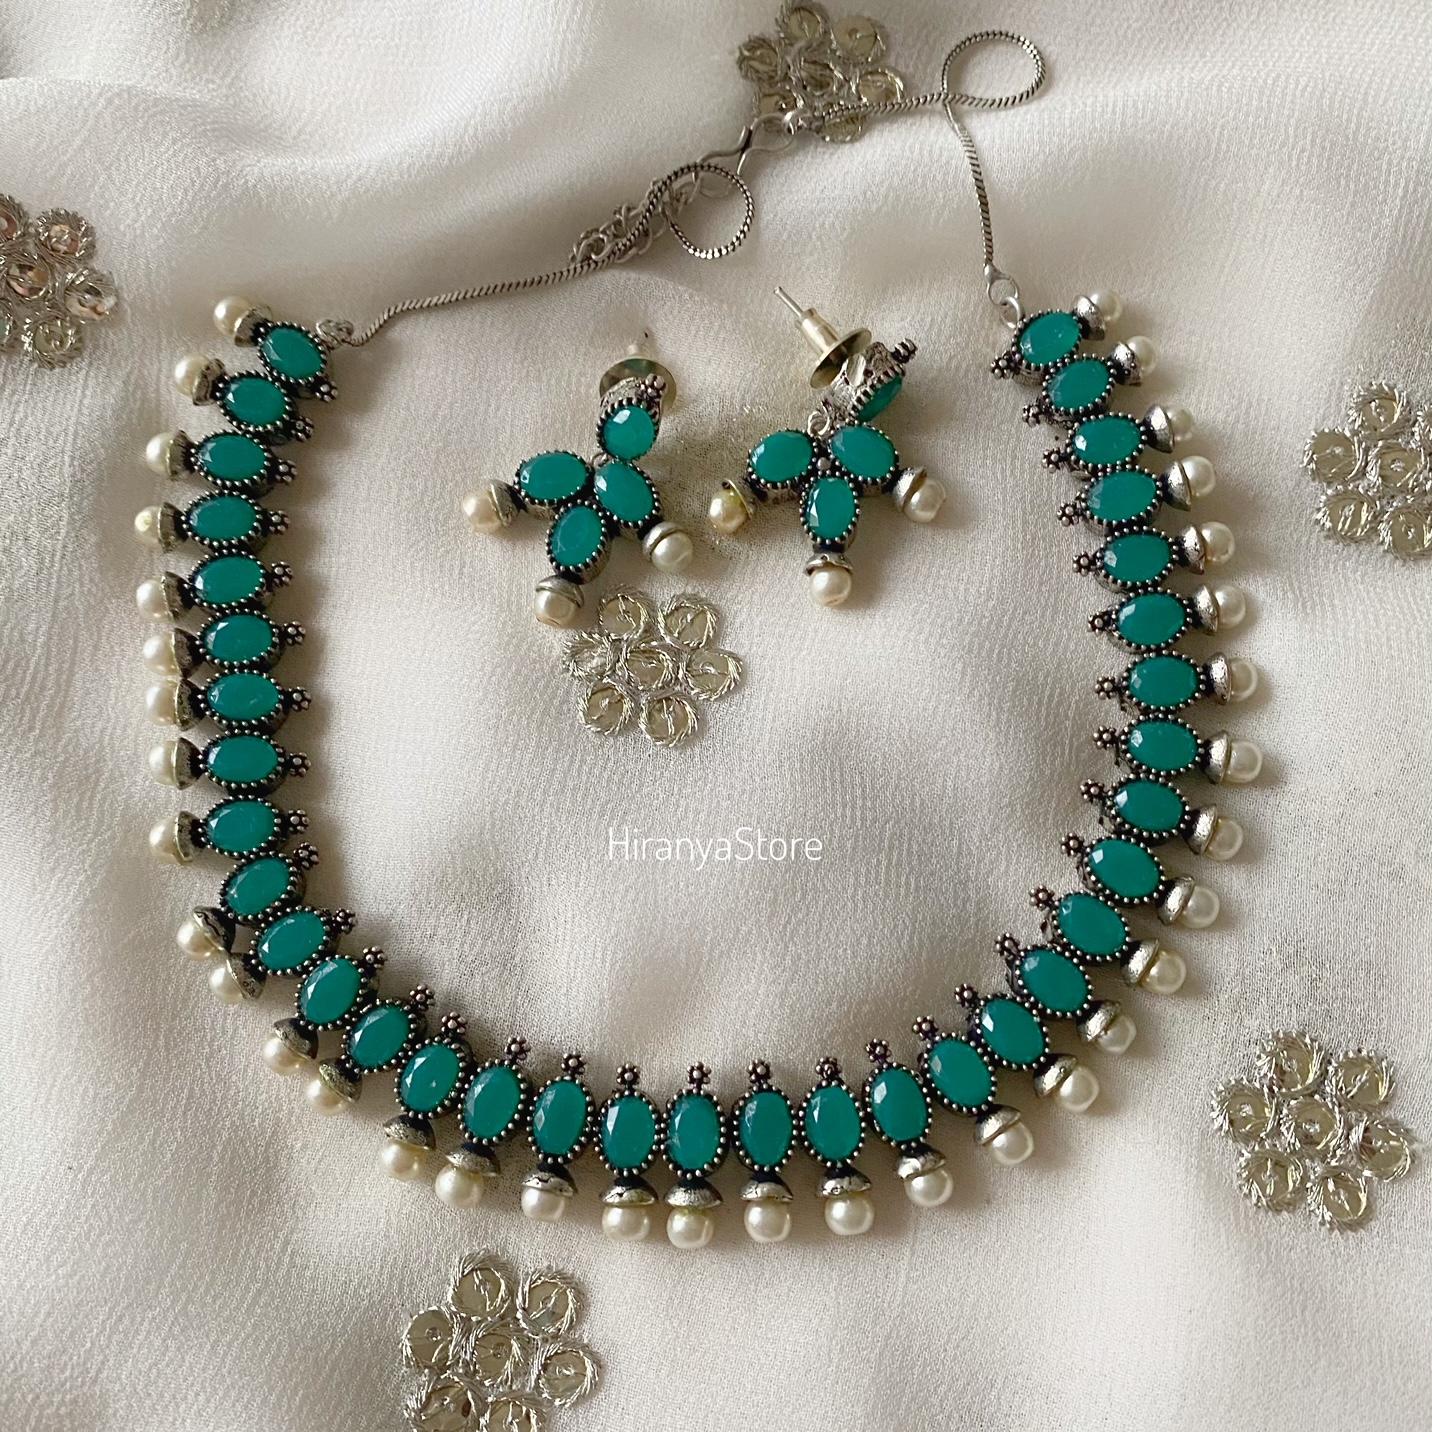 Sleek Necklace Set in Green